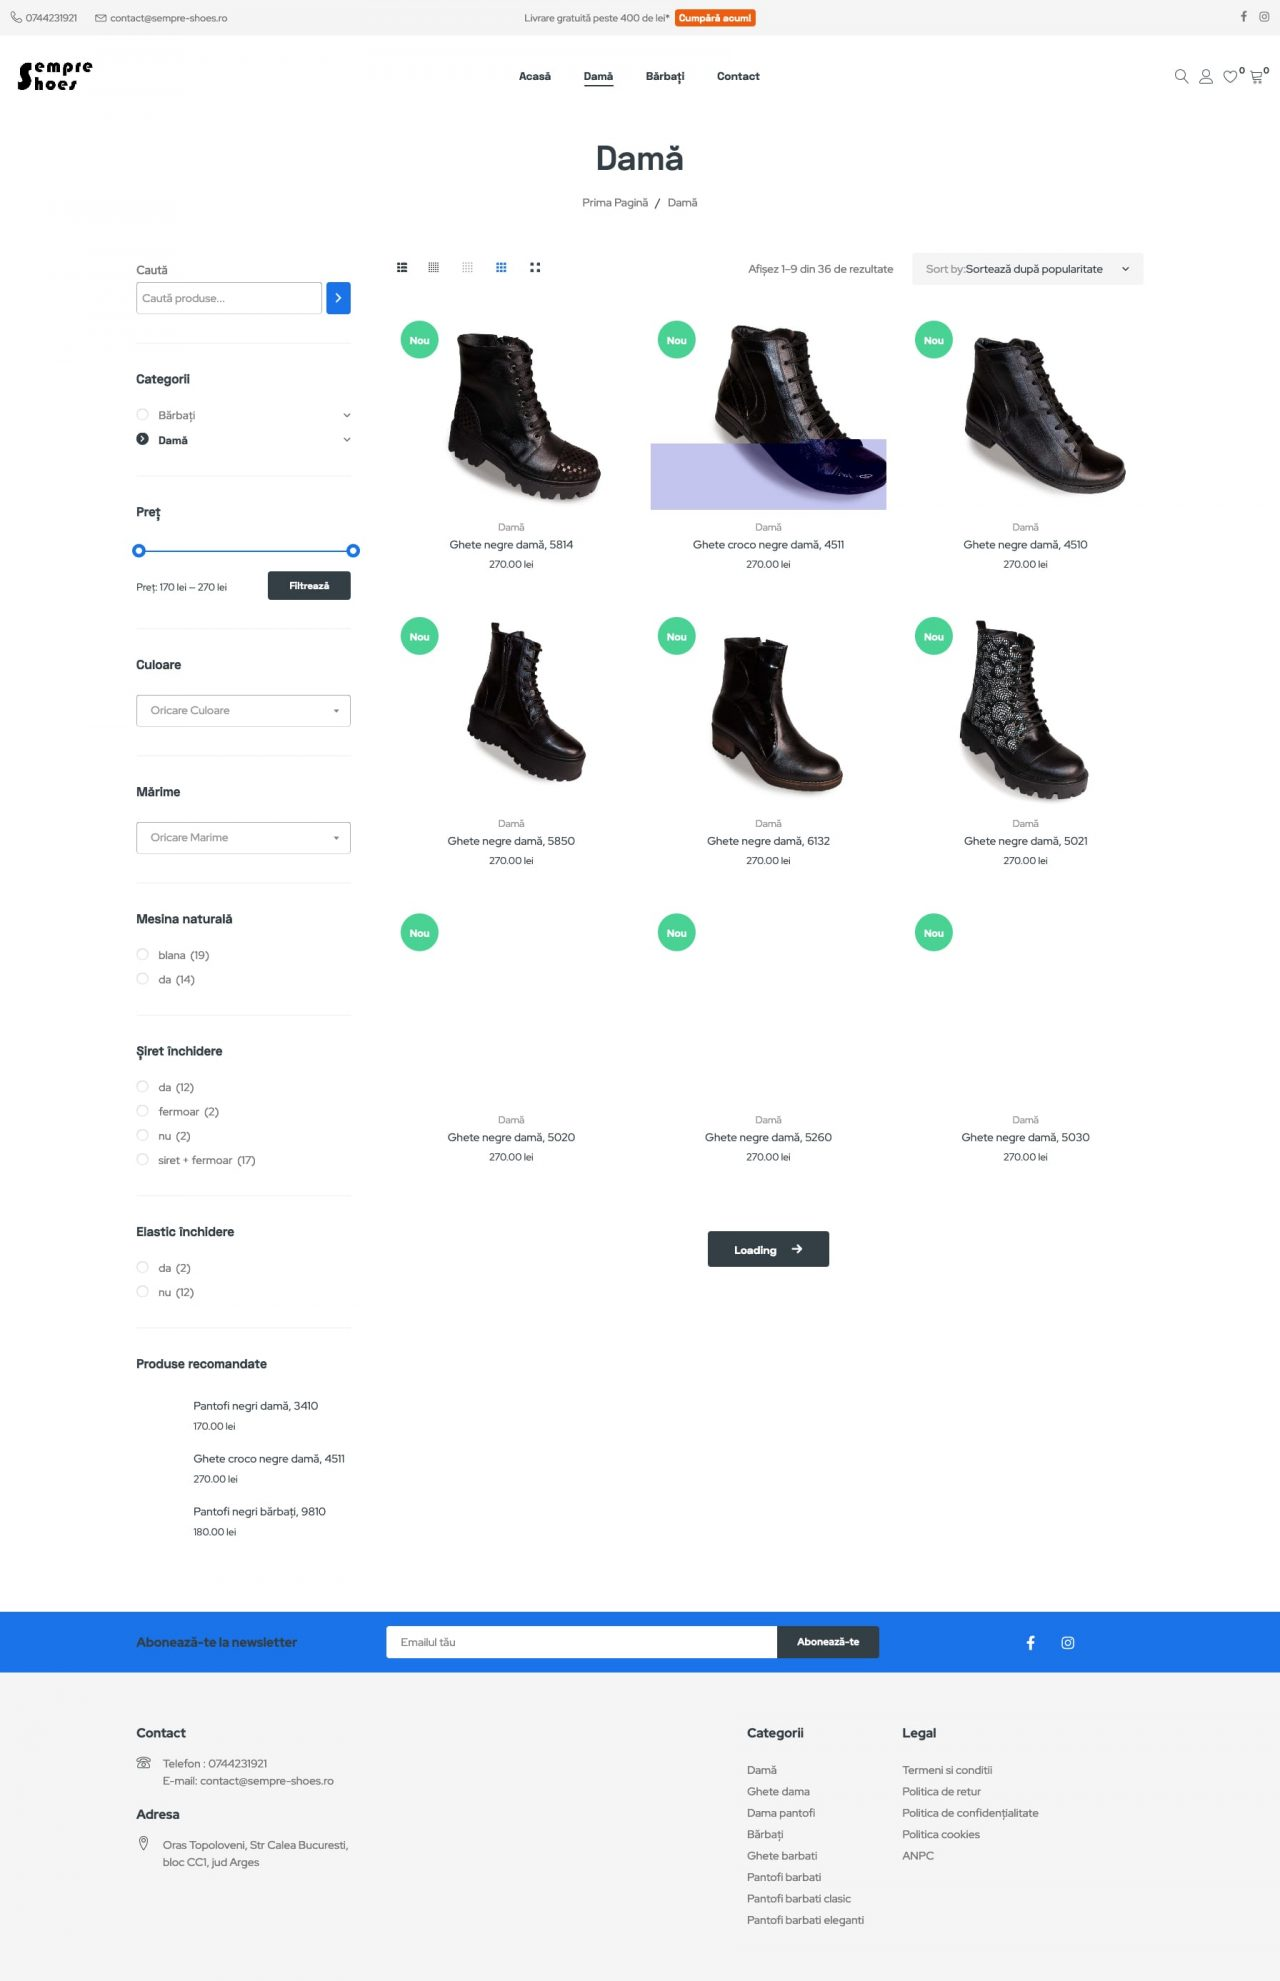 magazin online de pantofi pagina categorie